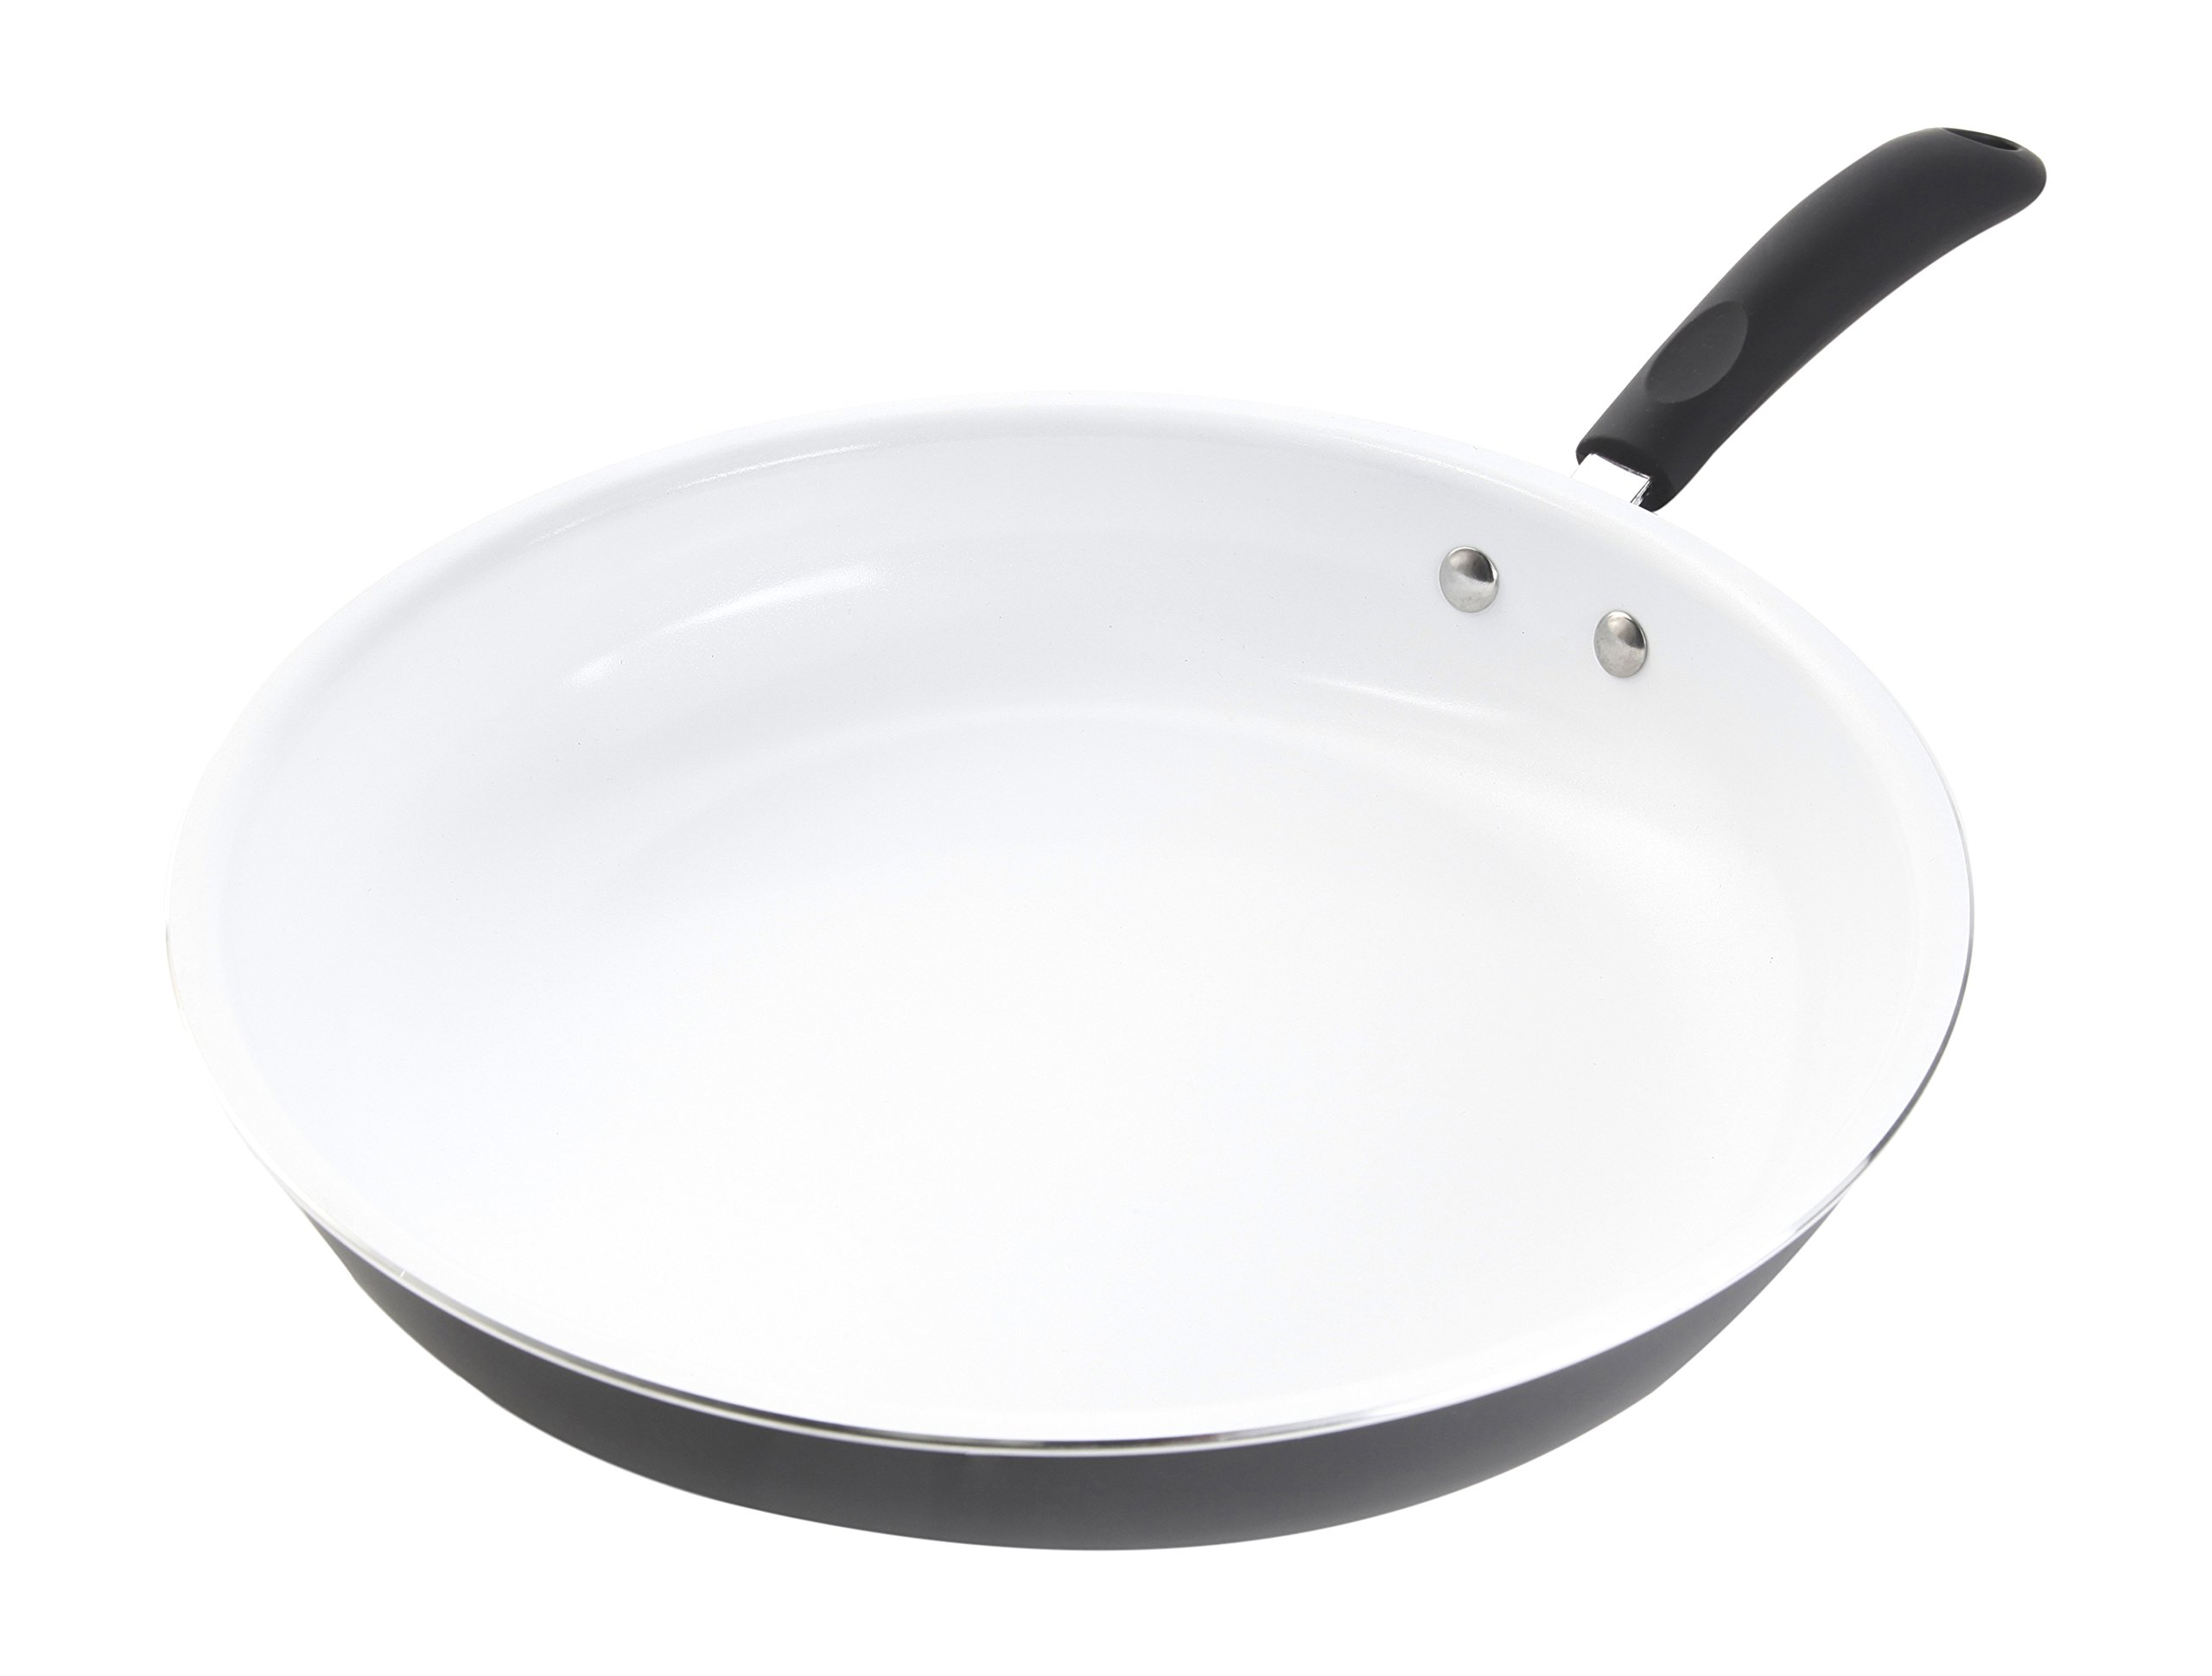 Gibson Home 64584.01 Hummington  12-Inch Ceramic Non-Stick Open Fry Pan, White